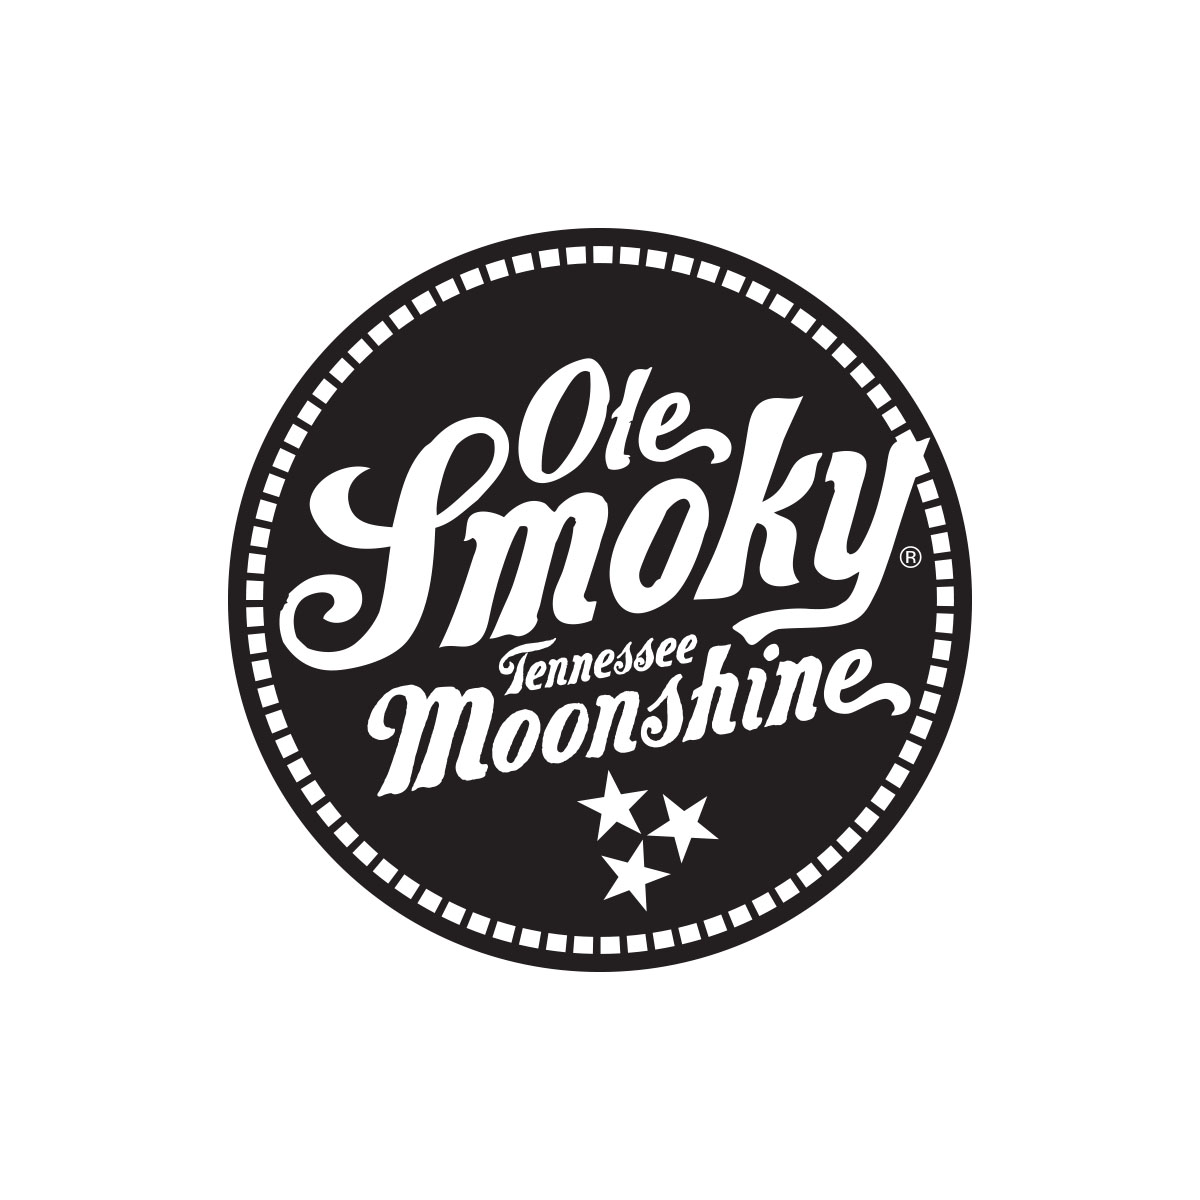 Ole Smoky Logo Thumbnail.jpg